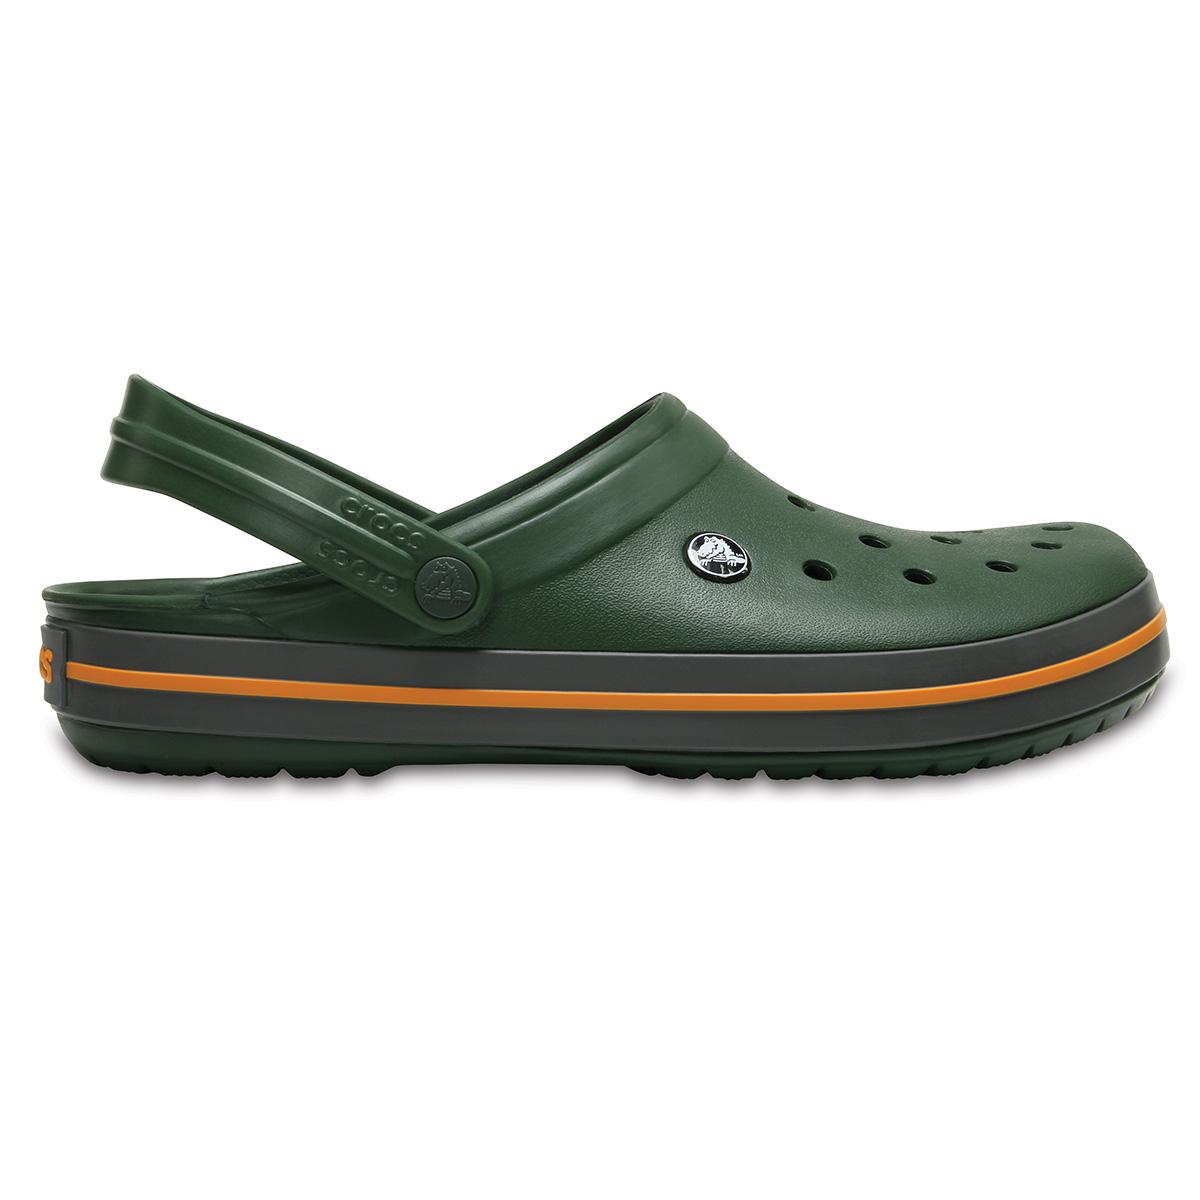 Crocs Crocband - Orman Yeşili/Barut Rengi